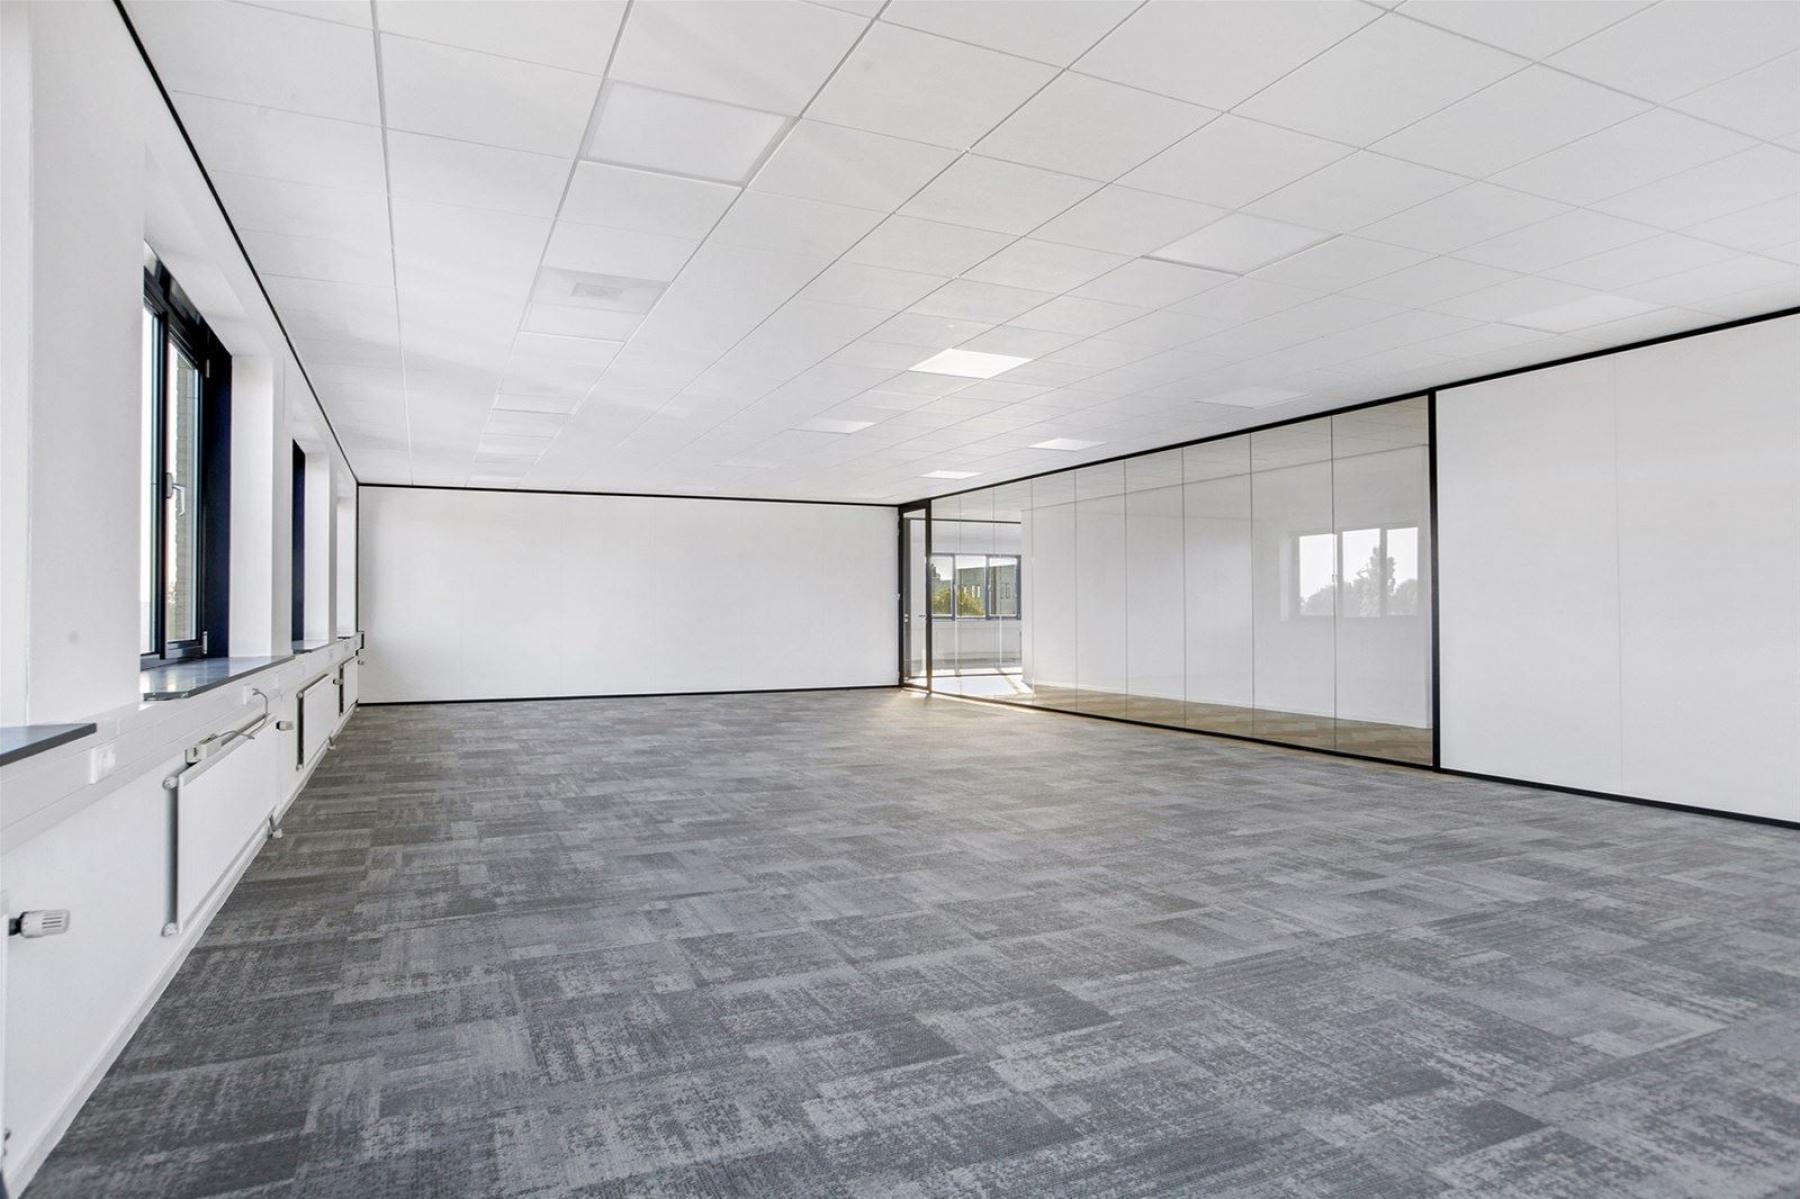 Grote kantoorunits met veel lichtinval